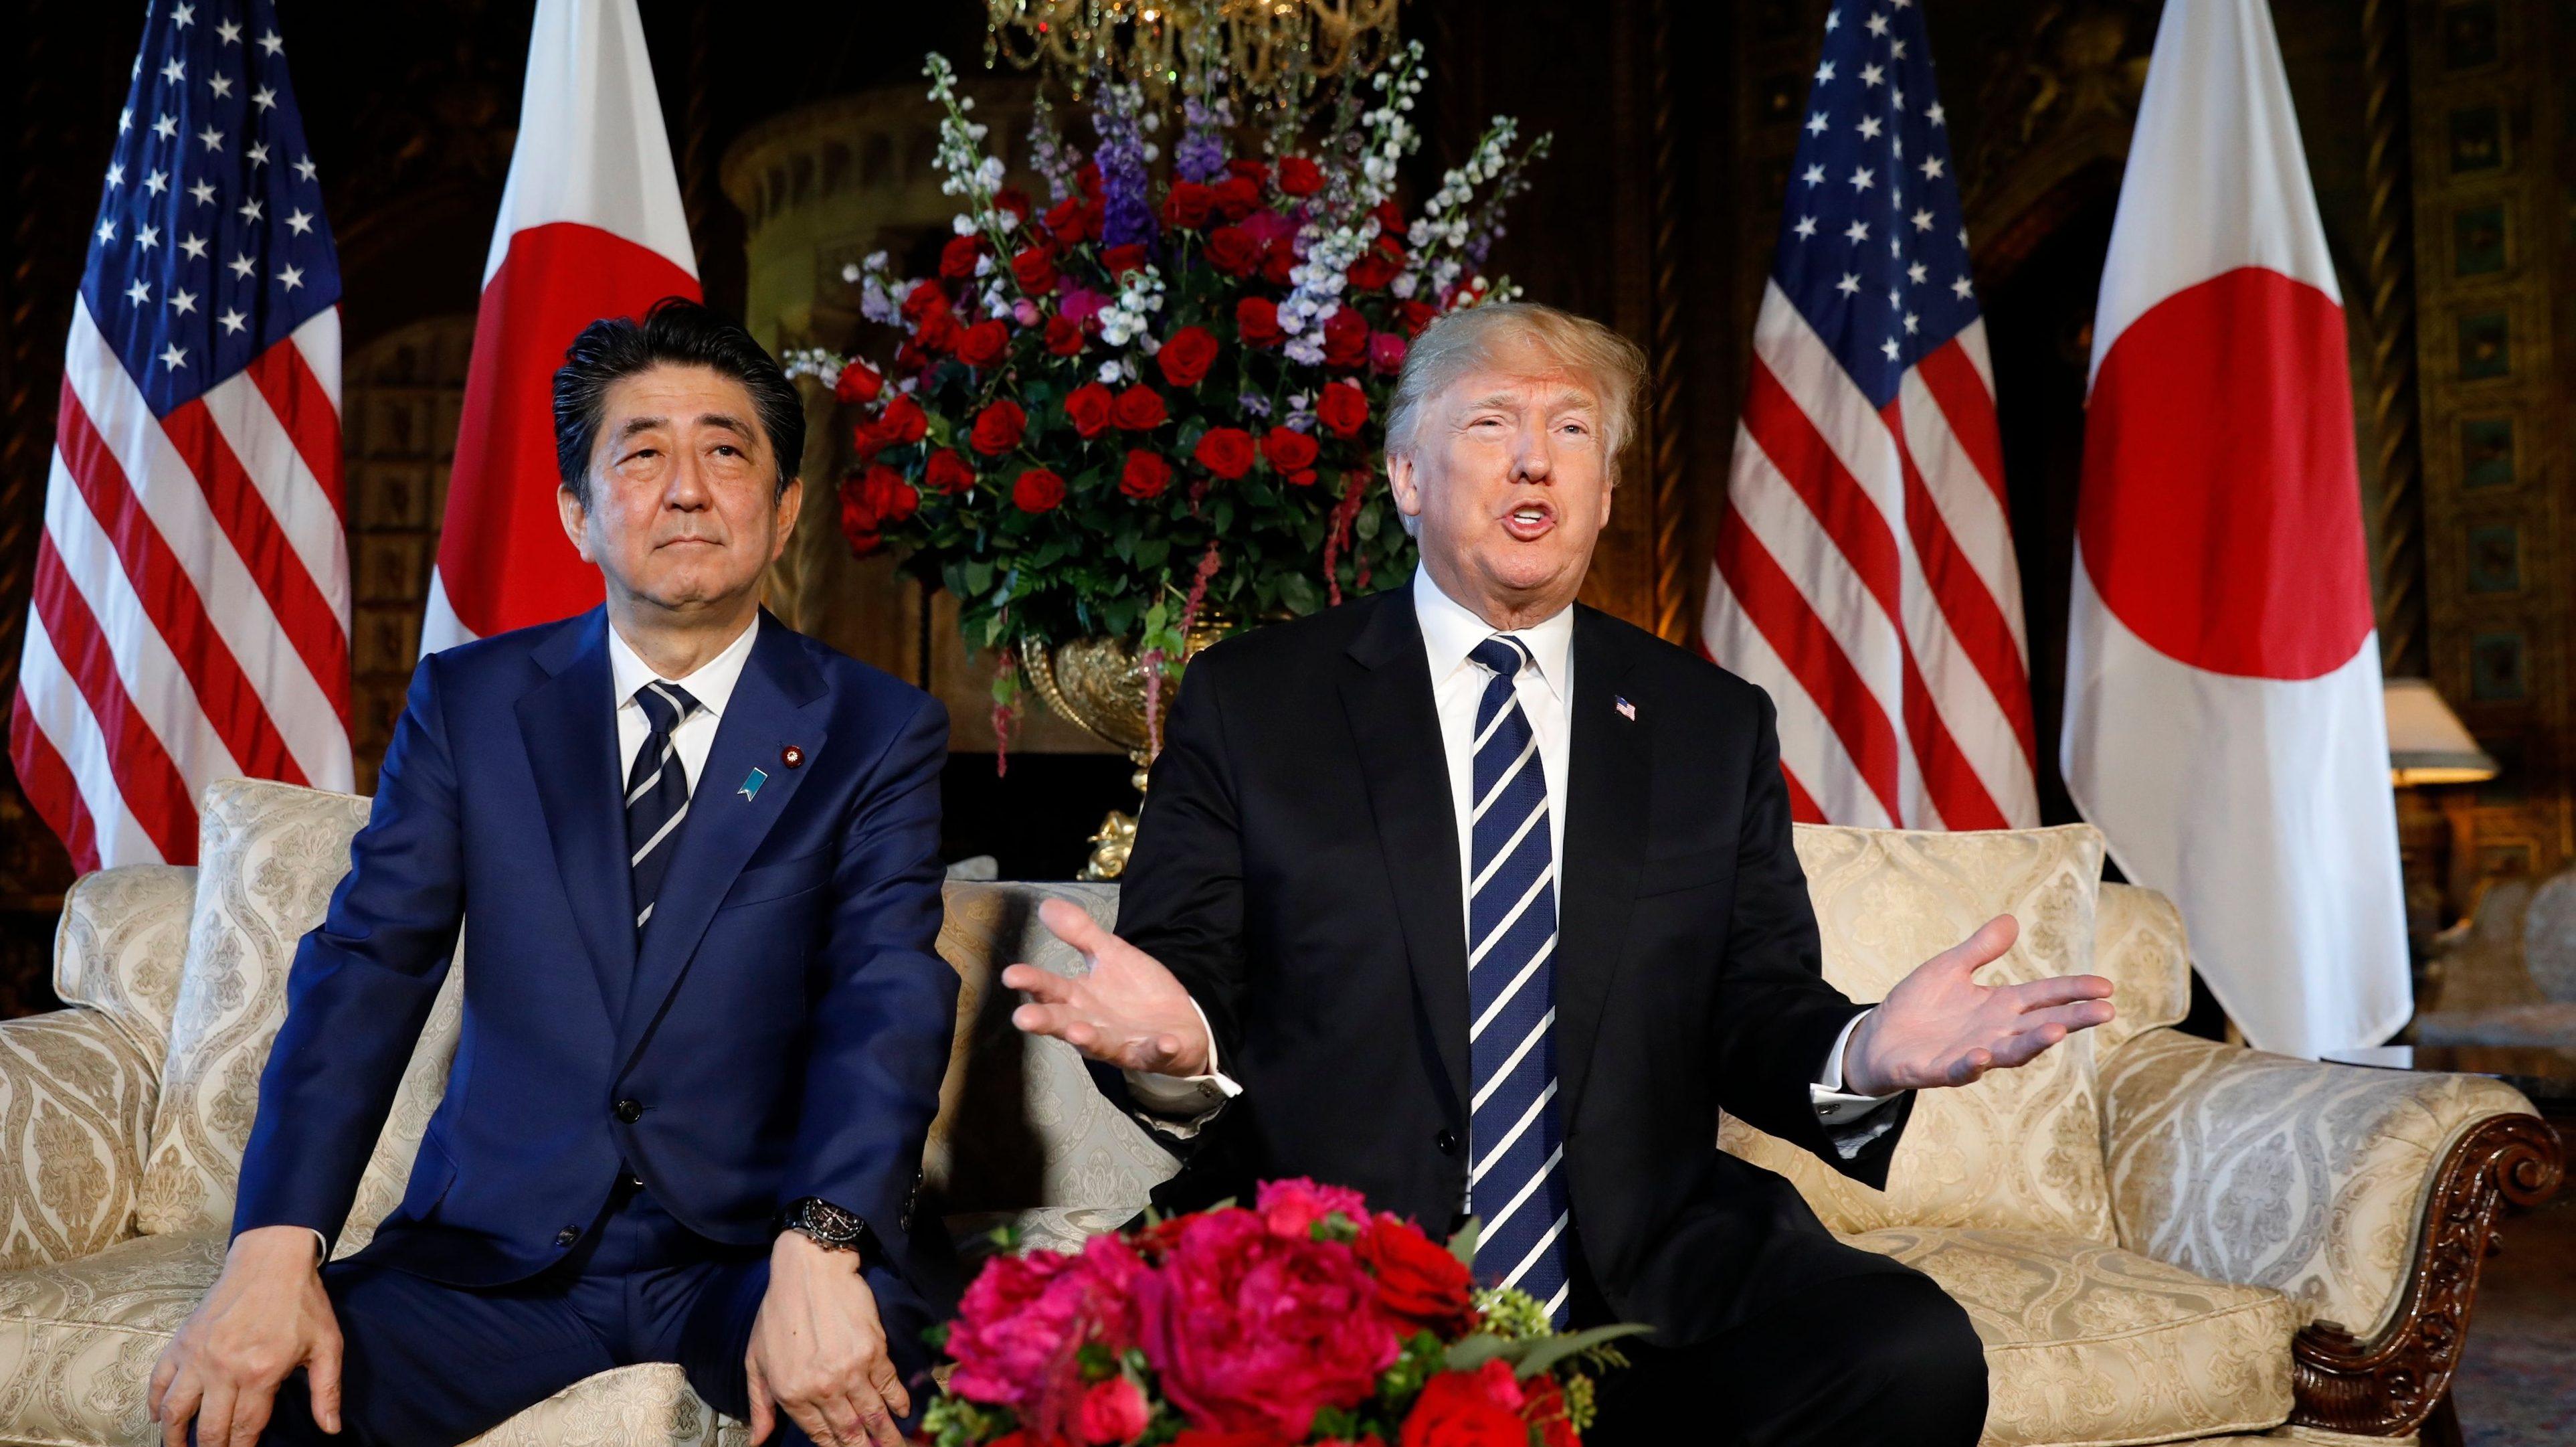 U.S. President Donald Trump speaks alongside Japan's Prime Minister Shinzo Abe before their bilateral meeting at Trump's Mar-a-Lago estate in Palm Beach, Florida U.S., April 17, 2018. REUTERS/Kevin Lamarque - HP1EE4H1HWXPJ